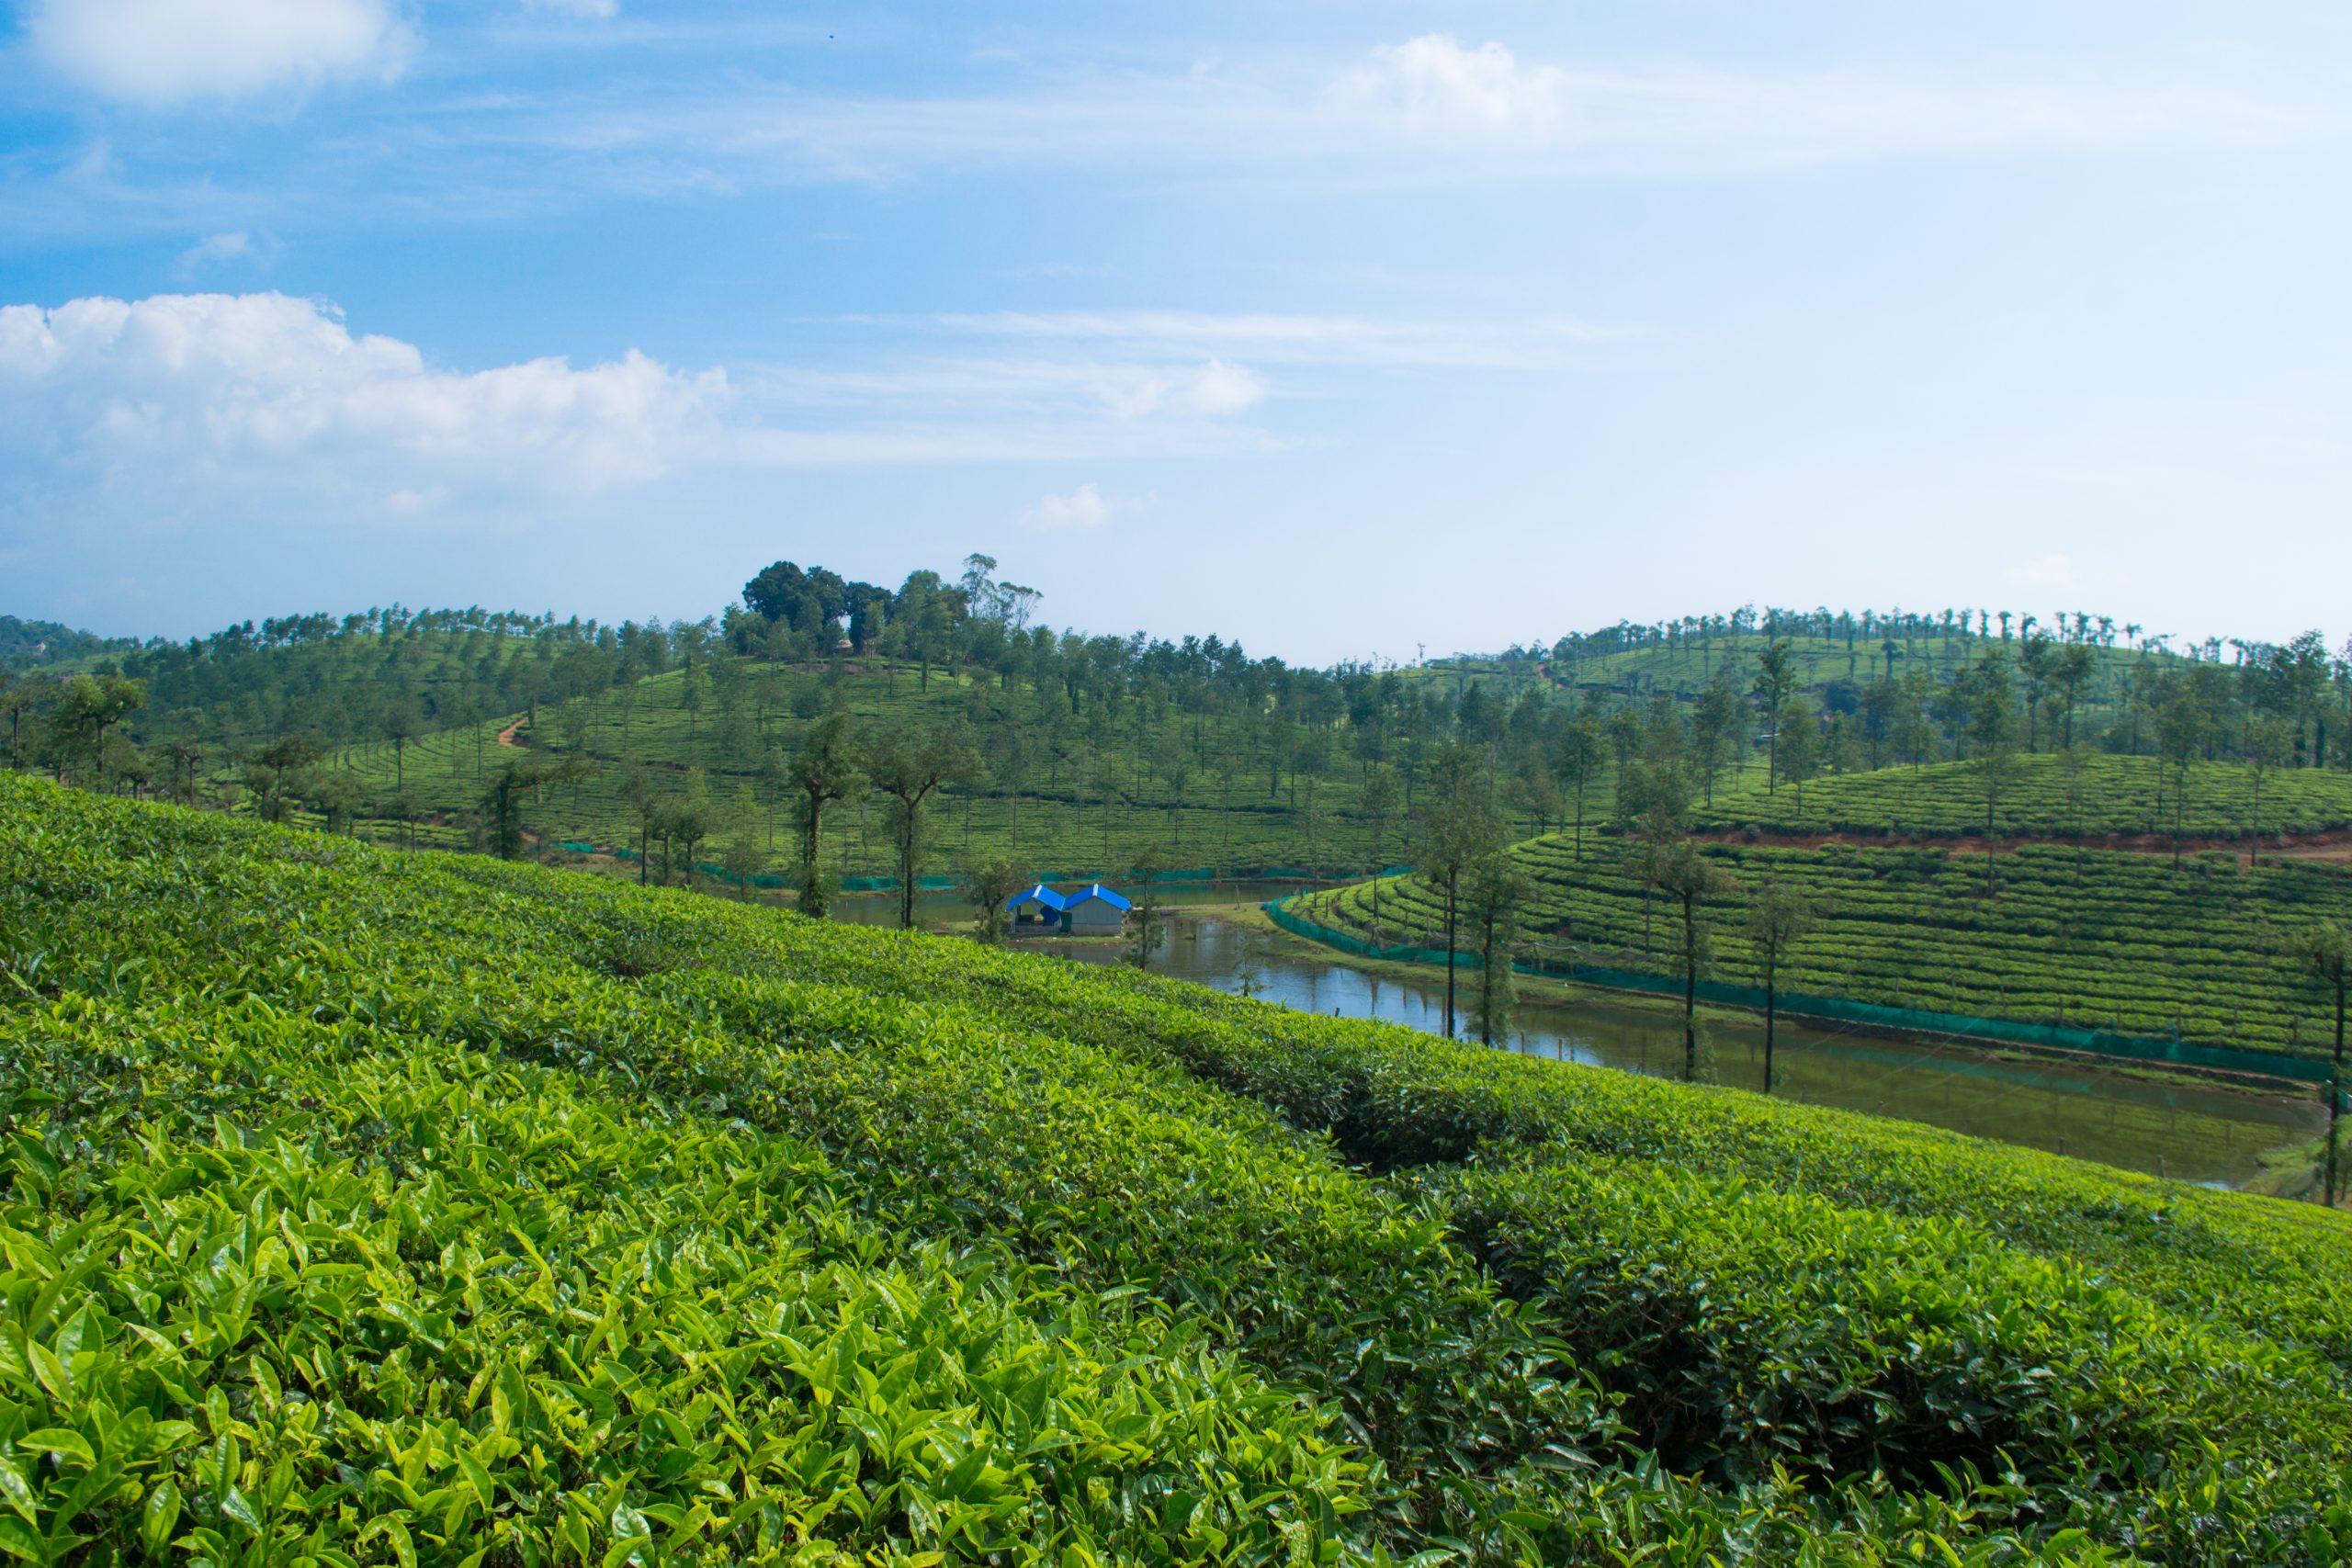 Landscape of a tree plantation